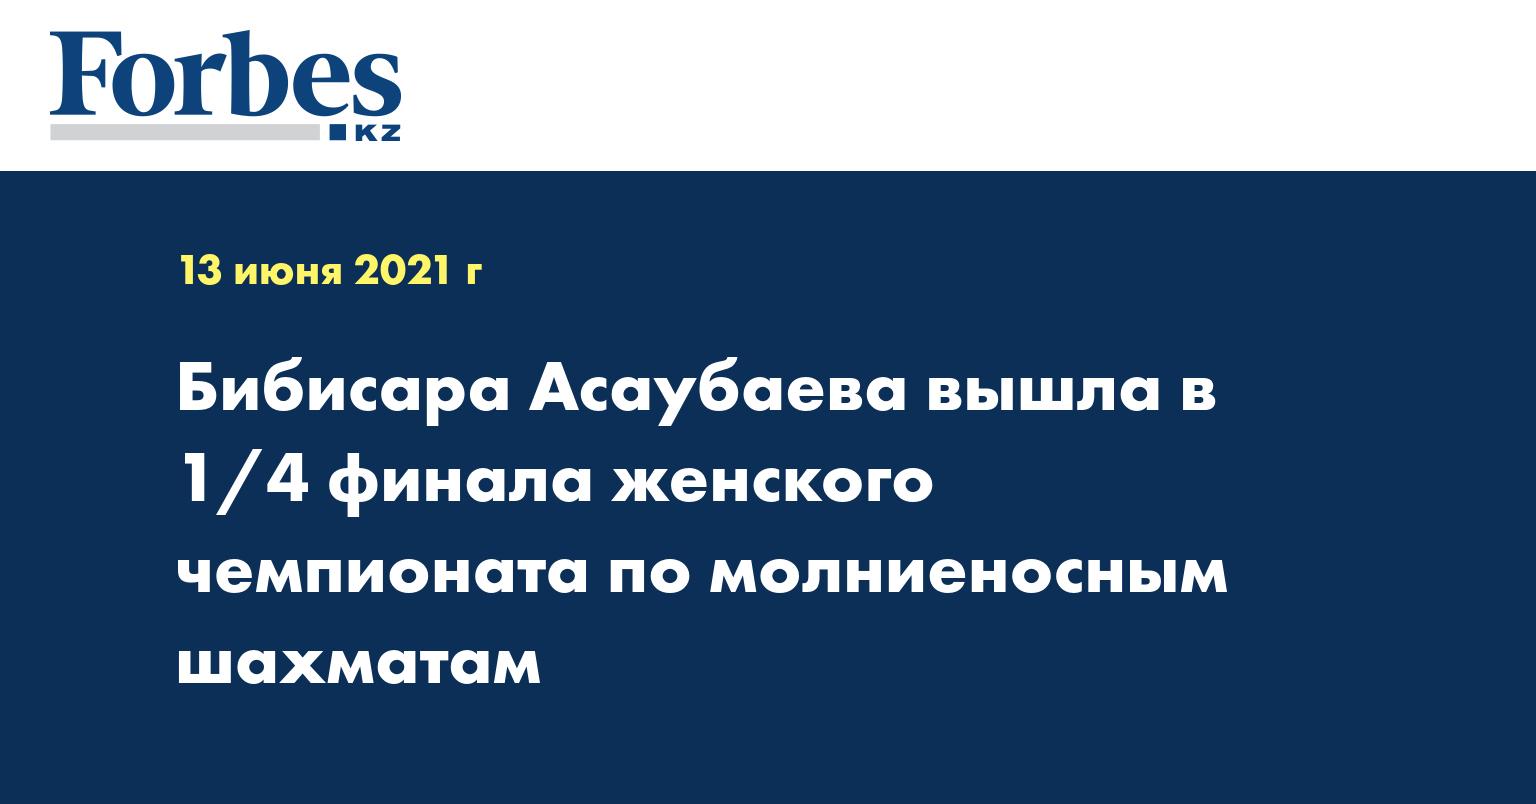 Бибисара Асаубаева вышла в 1/4 финала женского чемпионата по молниеносным шахматам